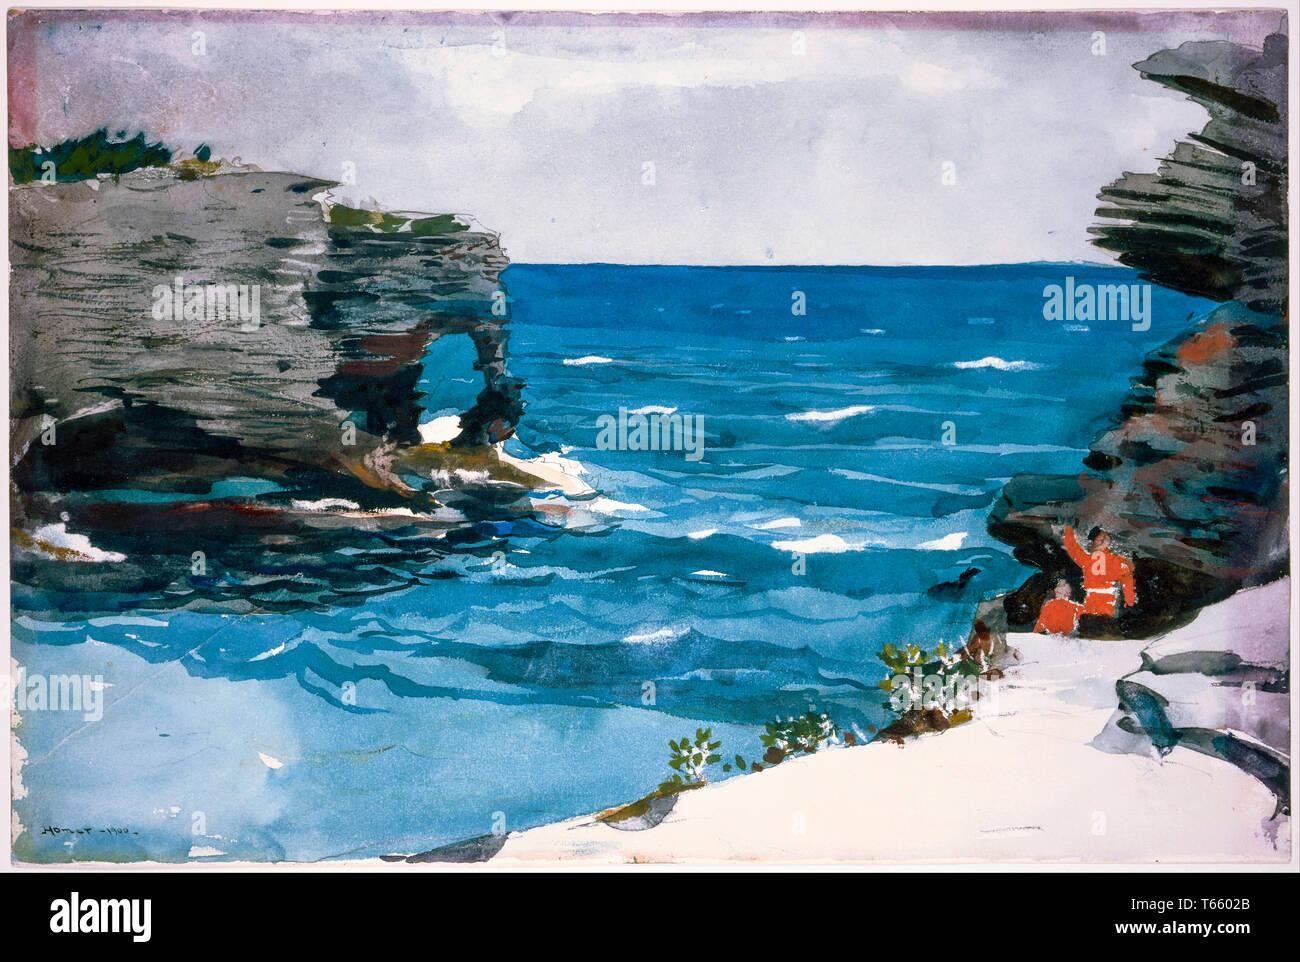 Winslow Homer, côte rocheuse, Bermudes, peinture, 1900 Photo Stock